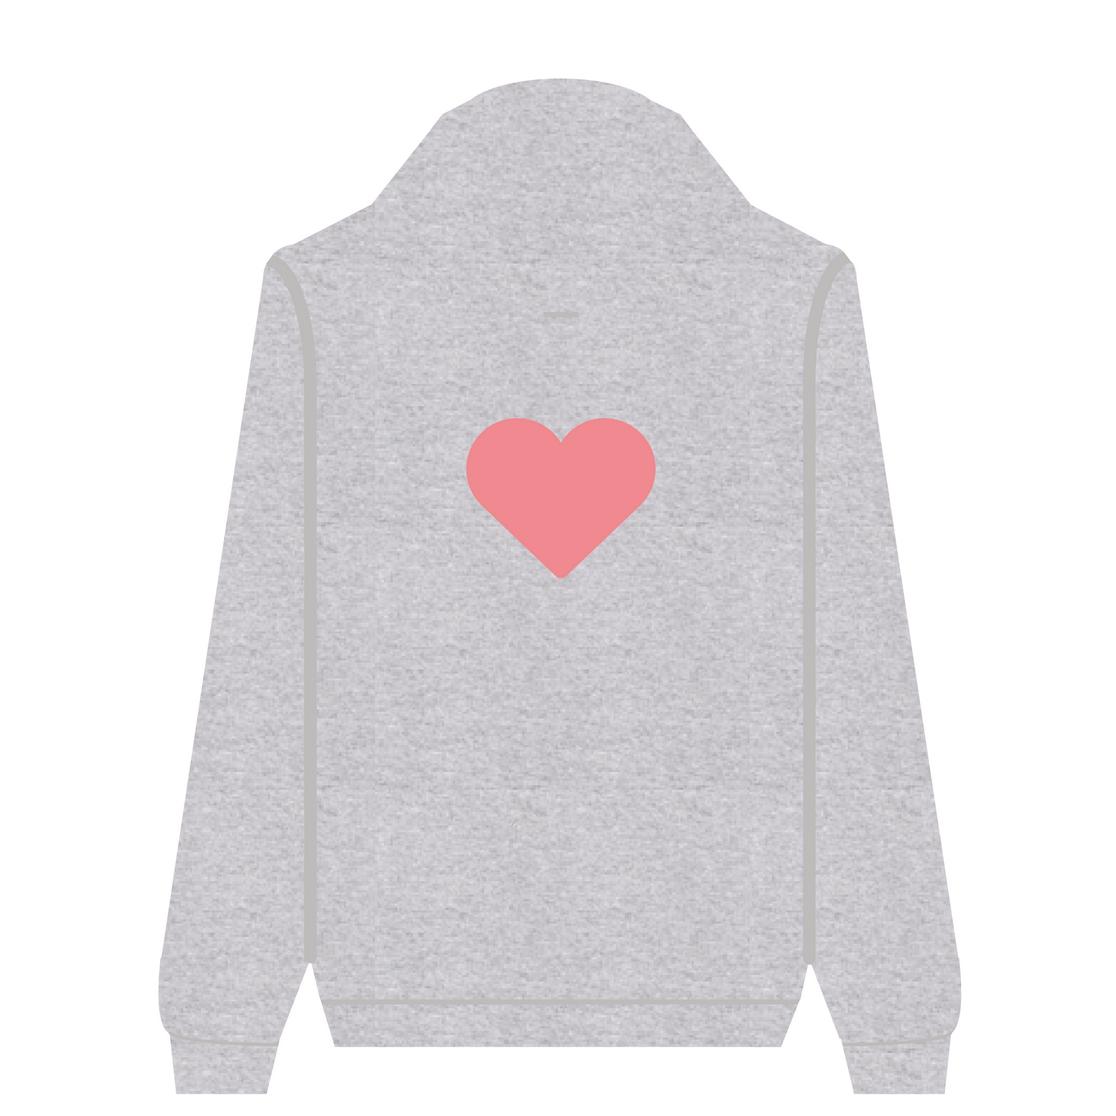 Full Zip Hoodie Love | Wuzzee